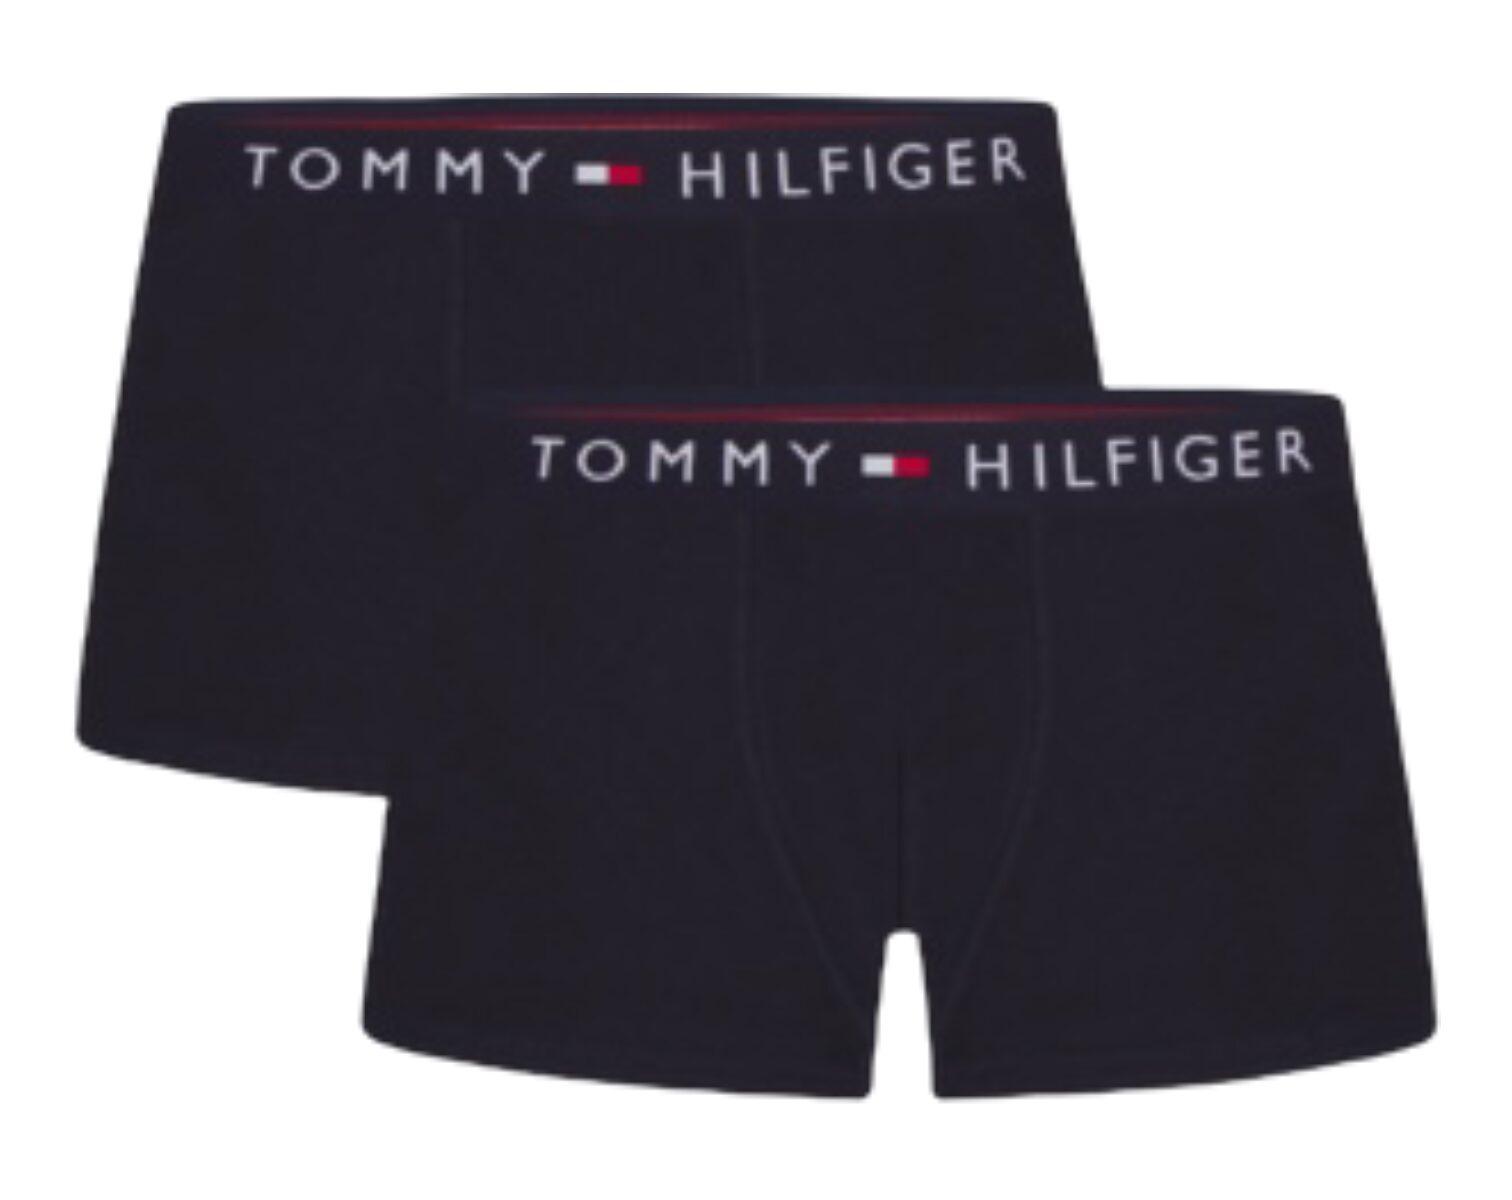 TOMMY HILFIGER TRUNK 2 PAK UNDERBUKSER UB0UB00341